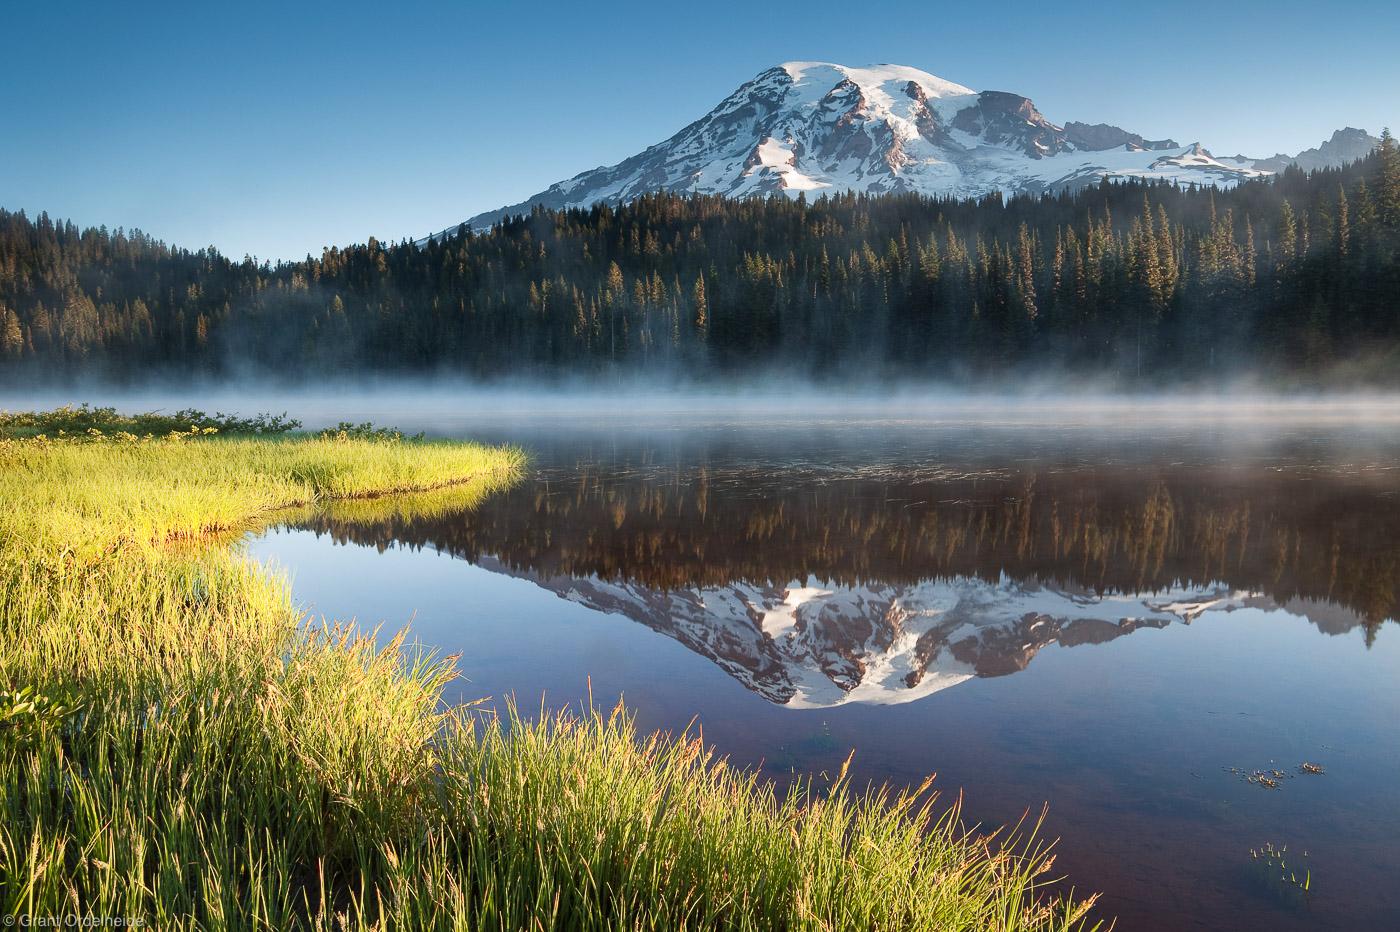 mt. rainier, washingtion, national park, reflection, lakes, early, morning, light, grass, paradise, photo